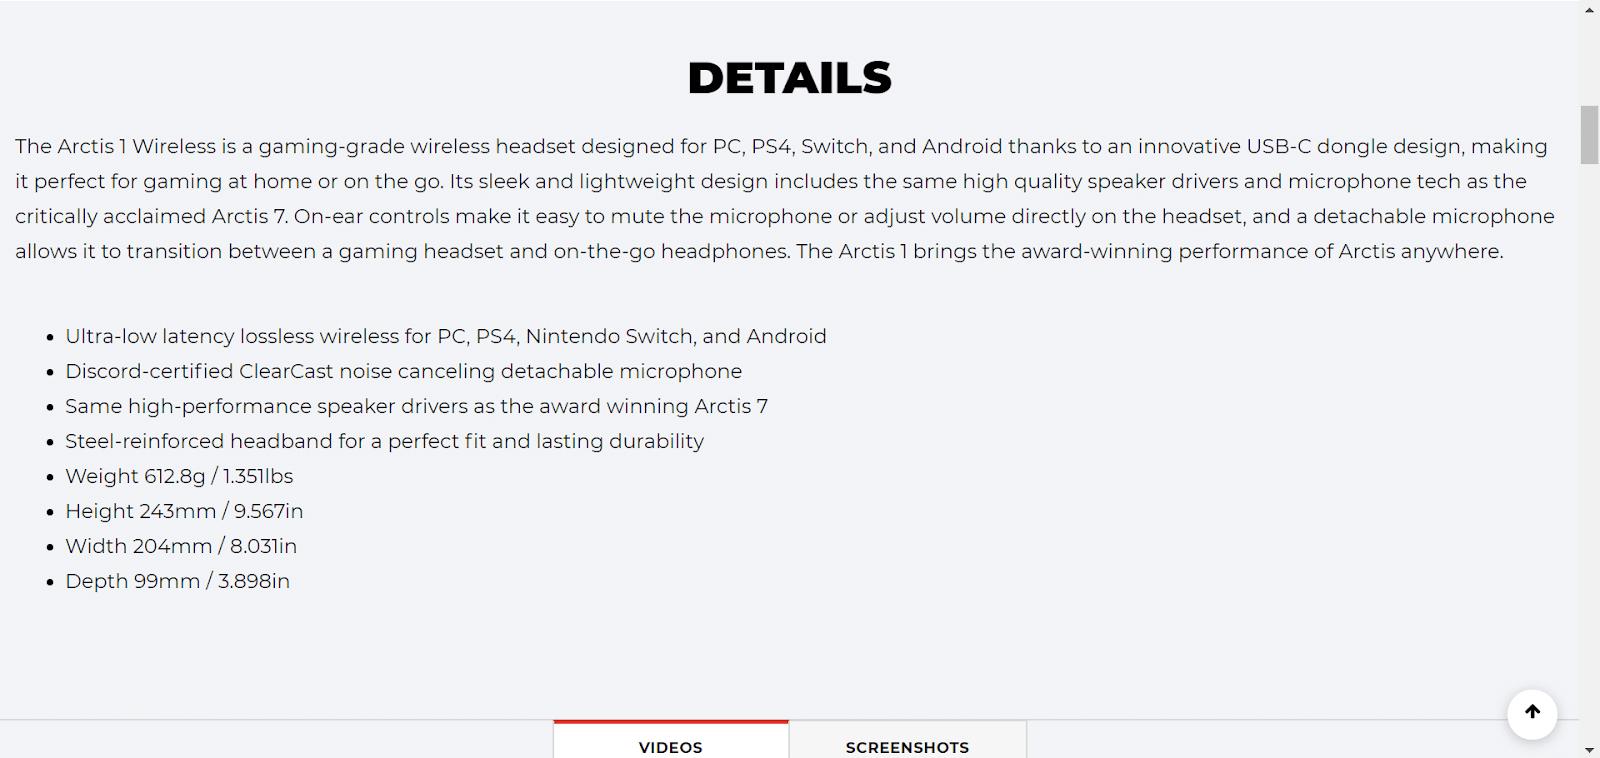 Gamestop Product Details